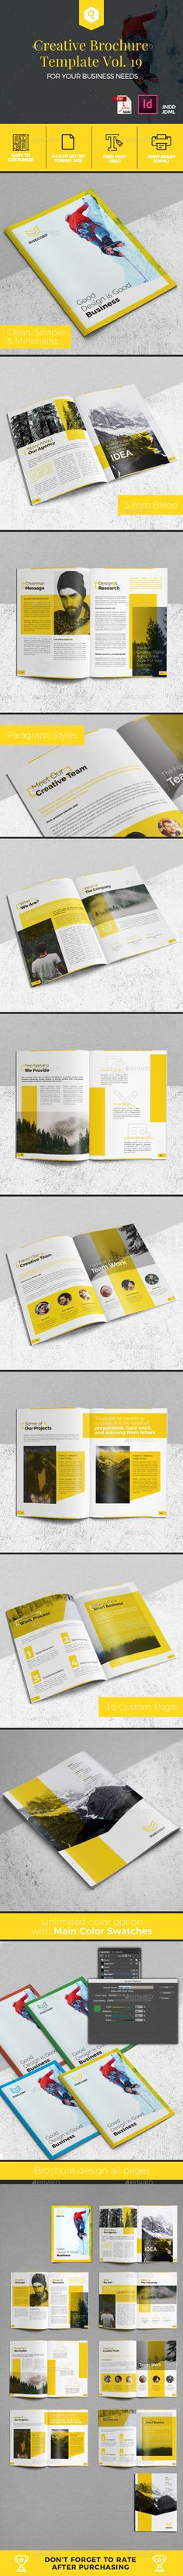 Creative Brochure Template Vol. 19